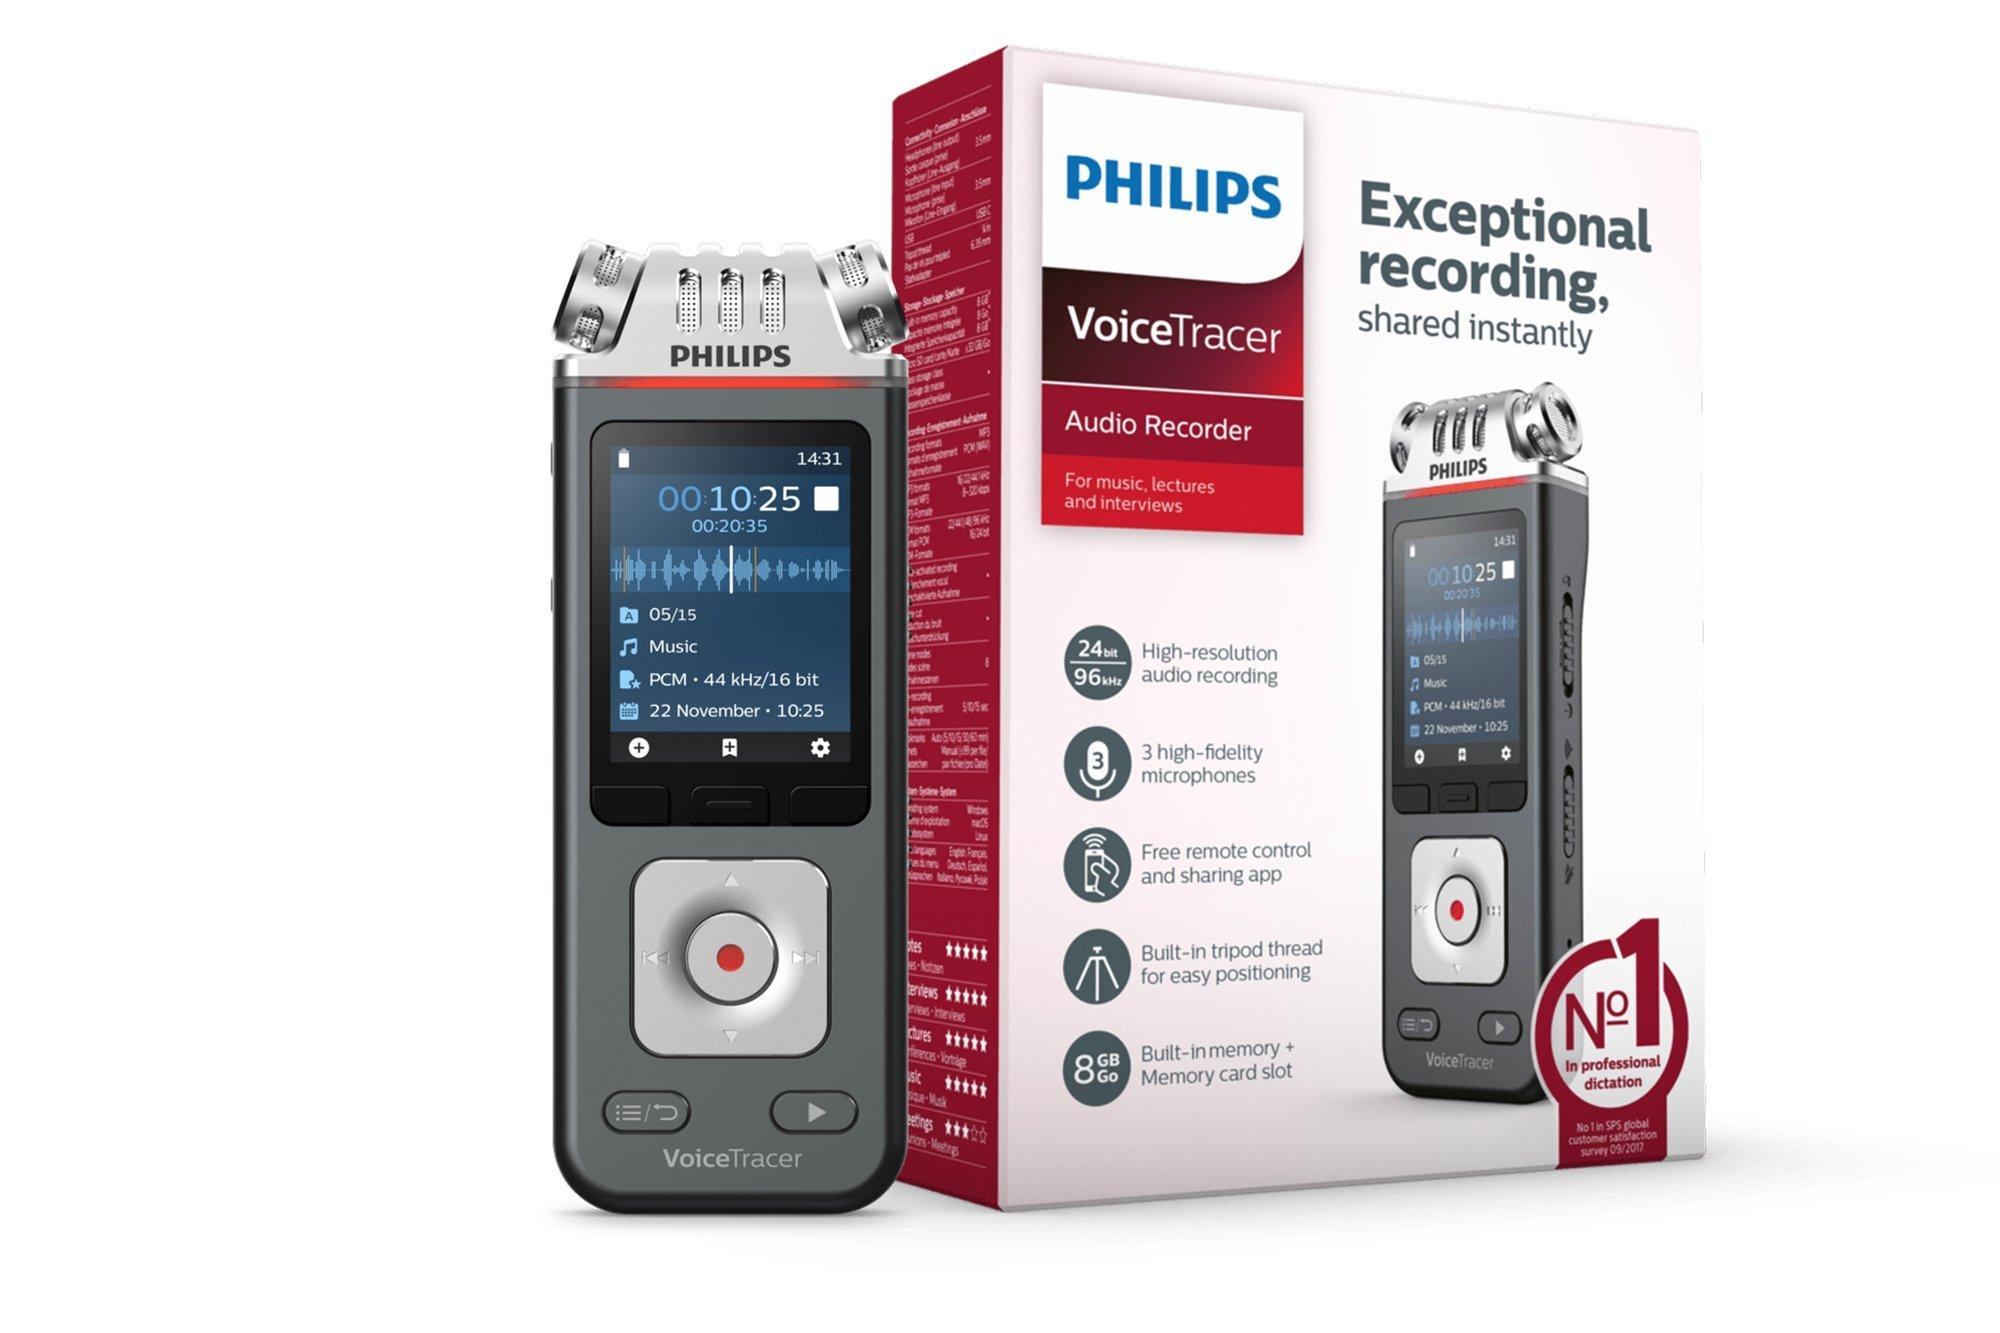 Philips VoiceTracer Audio Recorder DVT6110 8GB